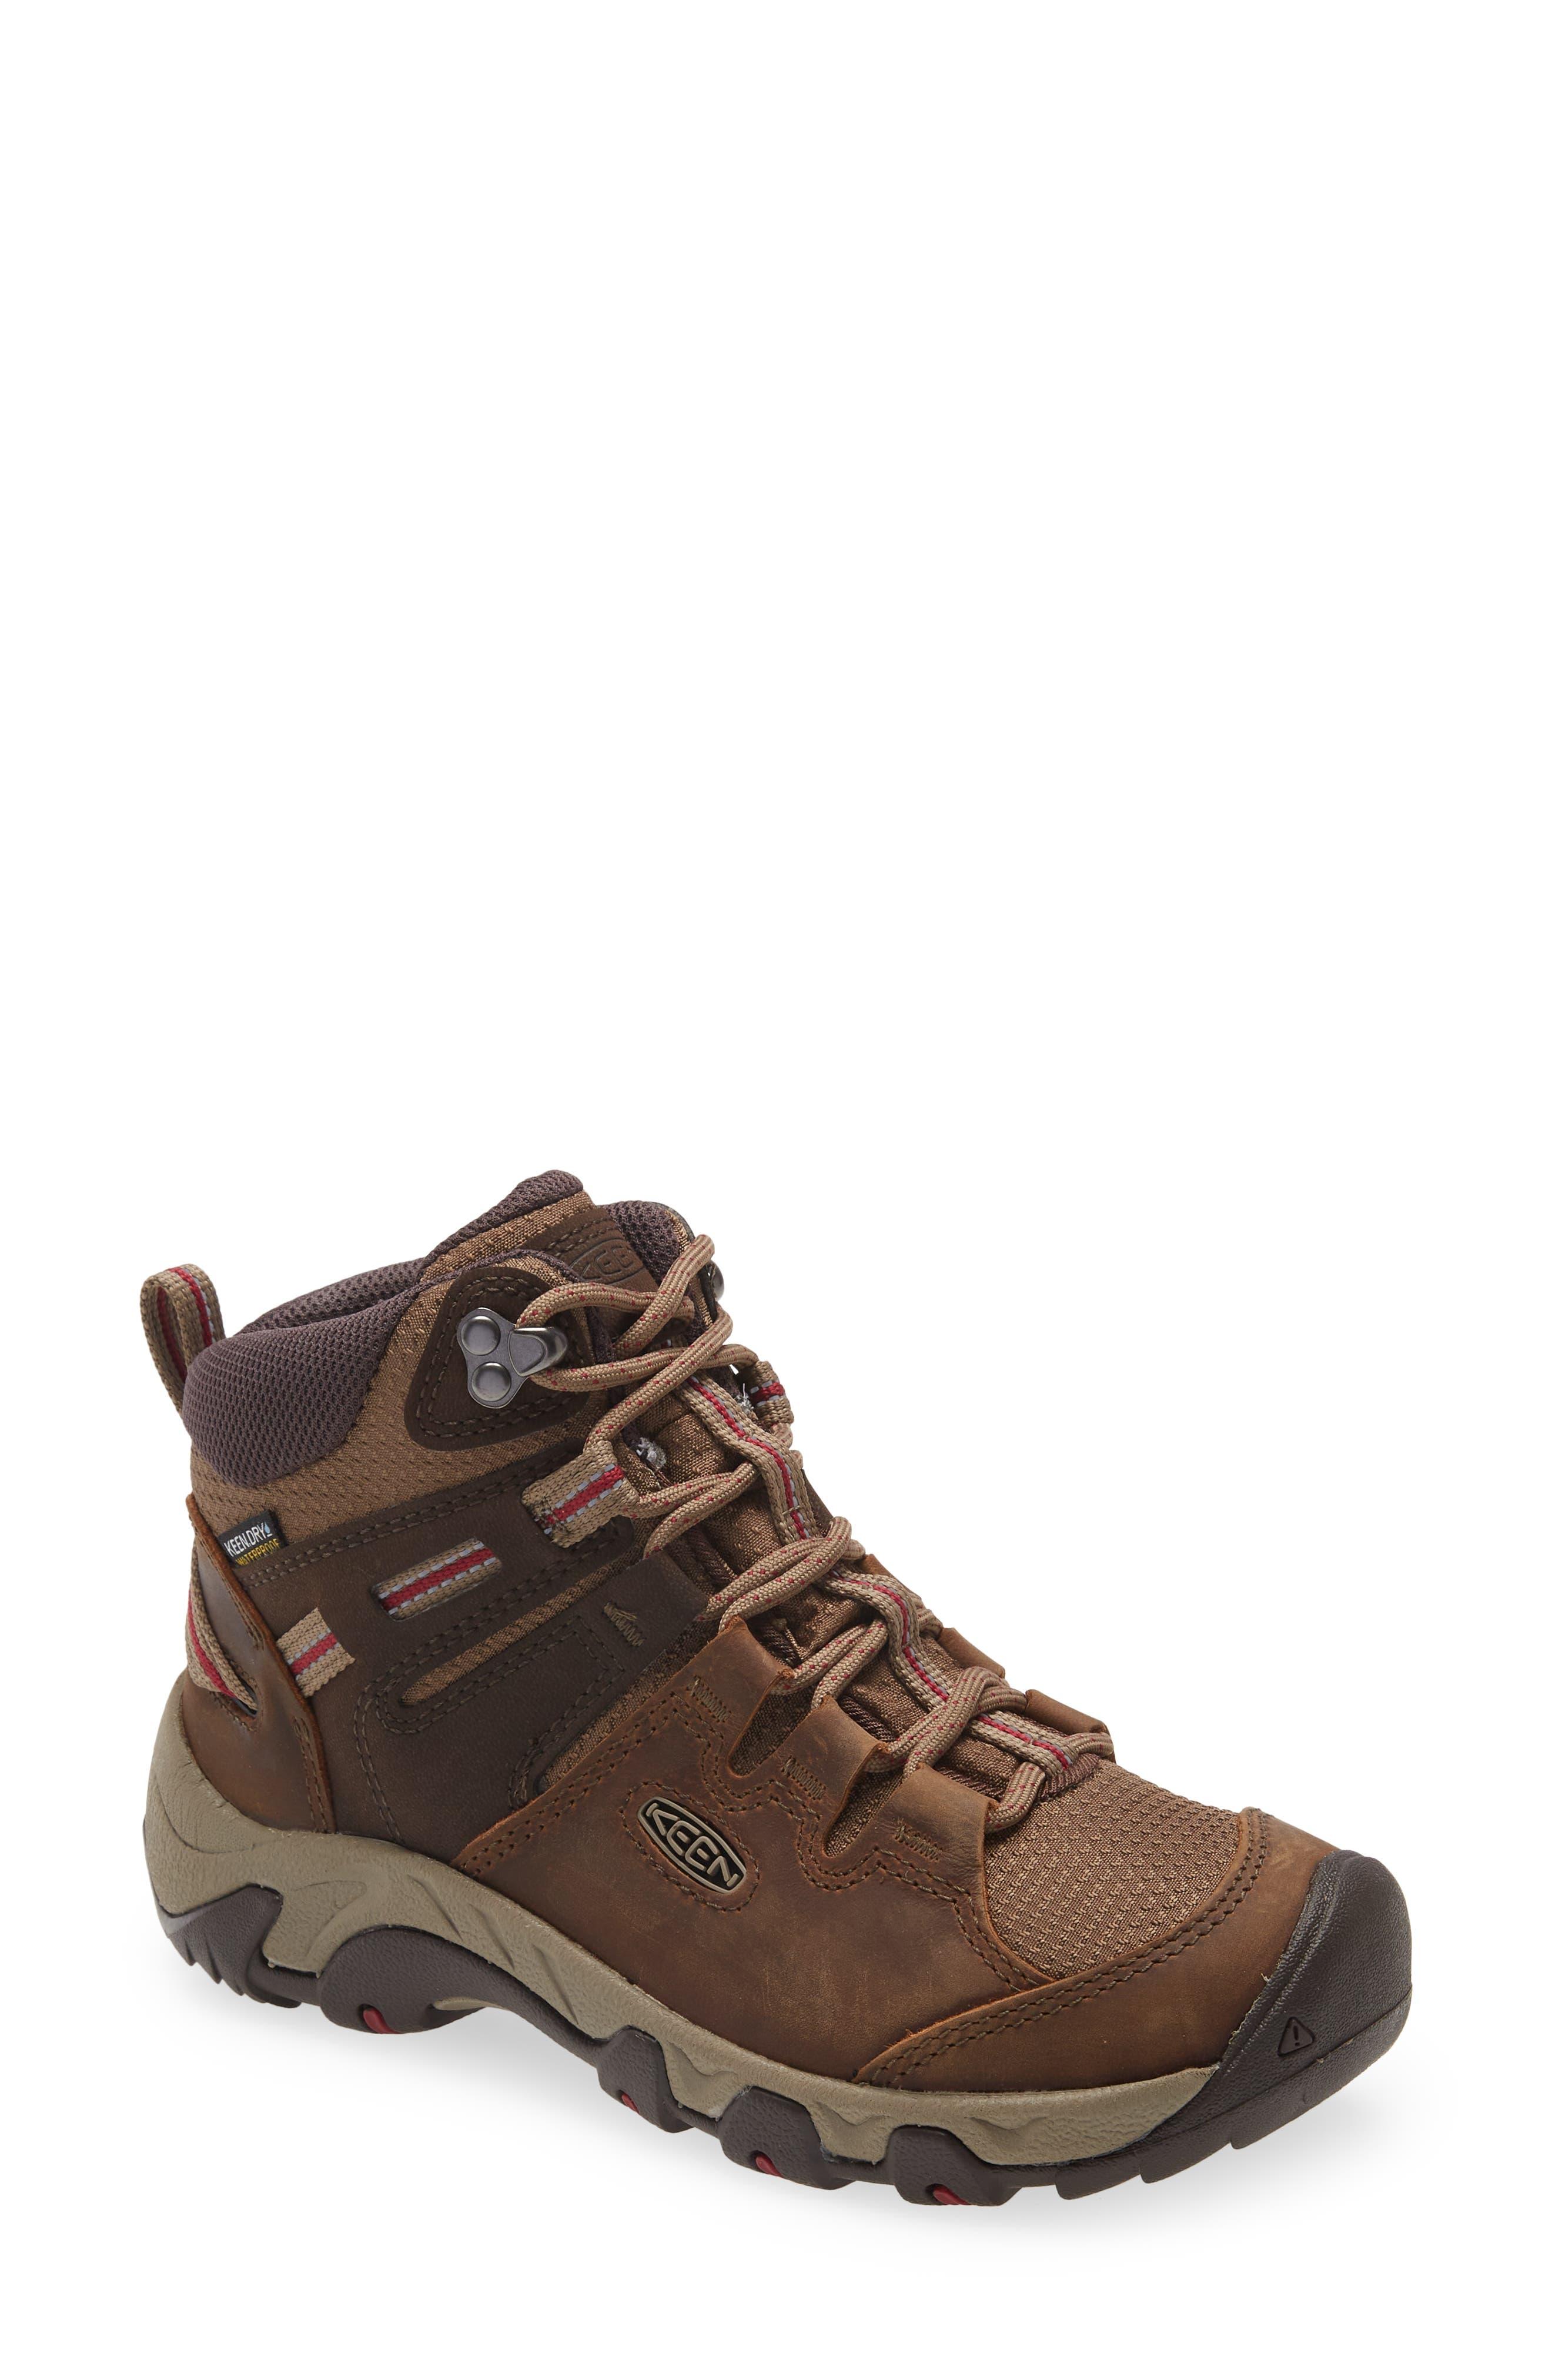 Steens Hiking Shoe